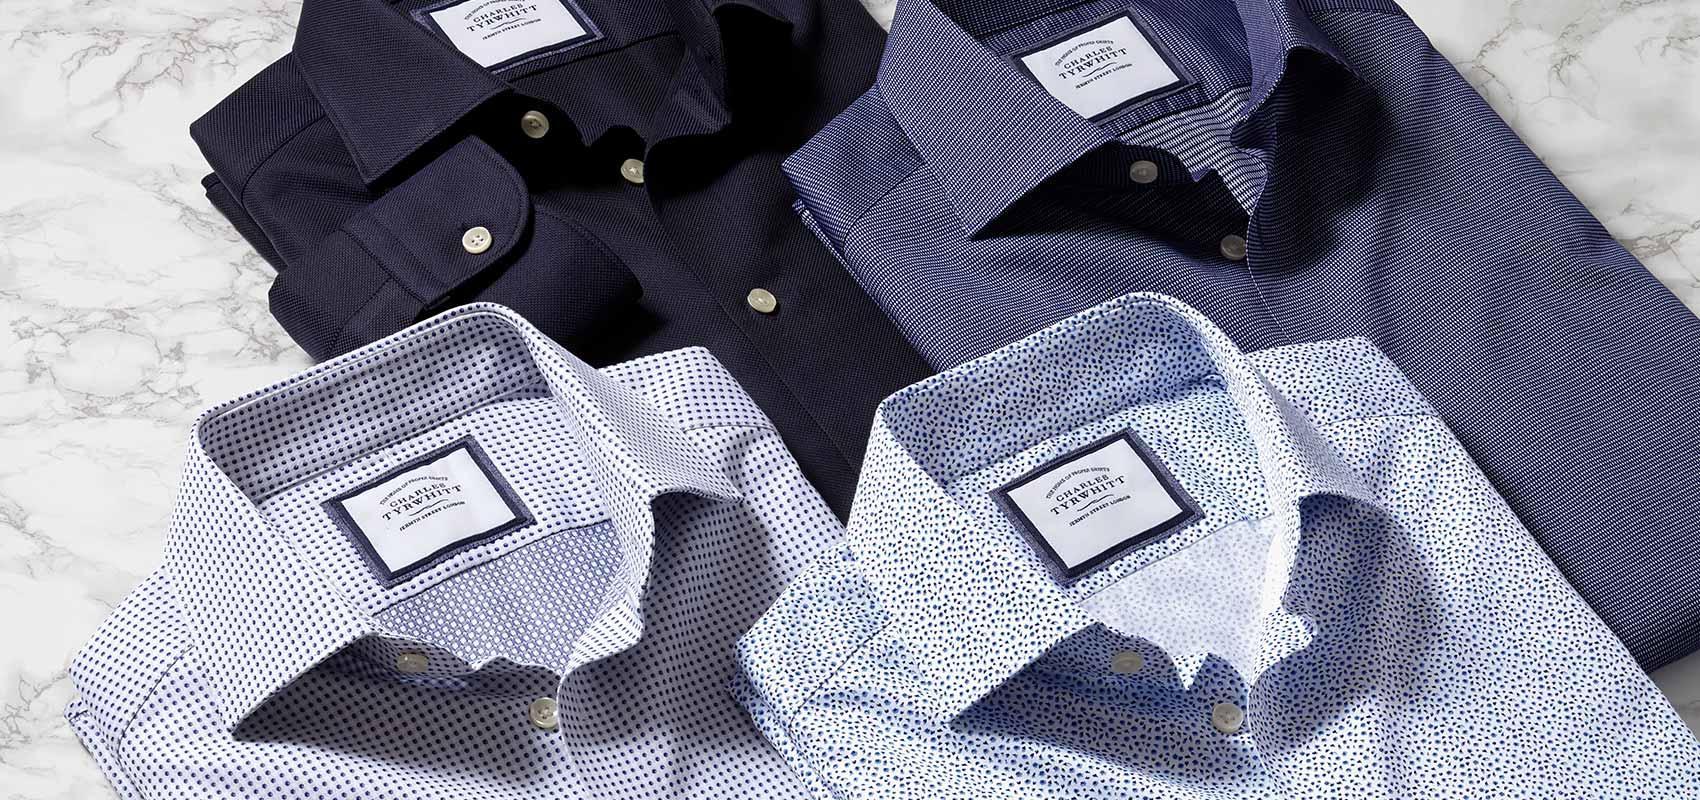 Charles Tyrwhitt printed shirts